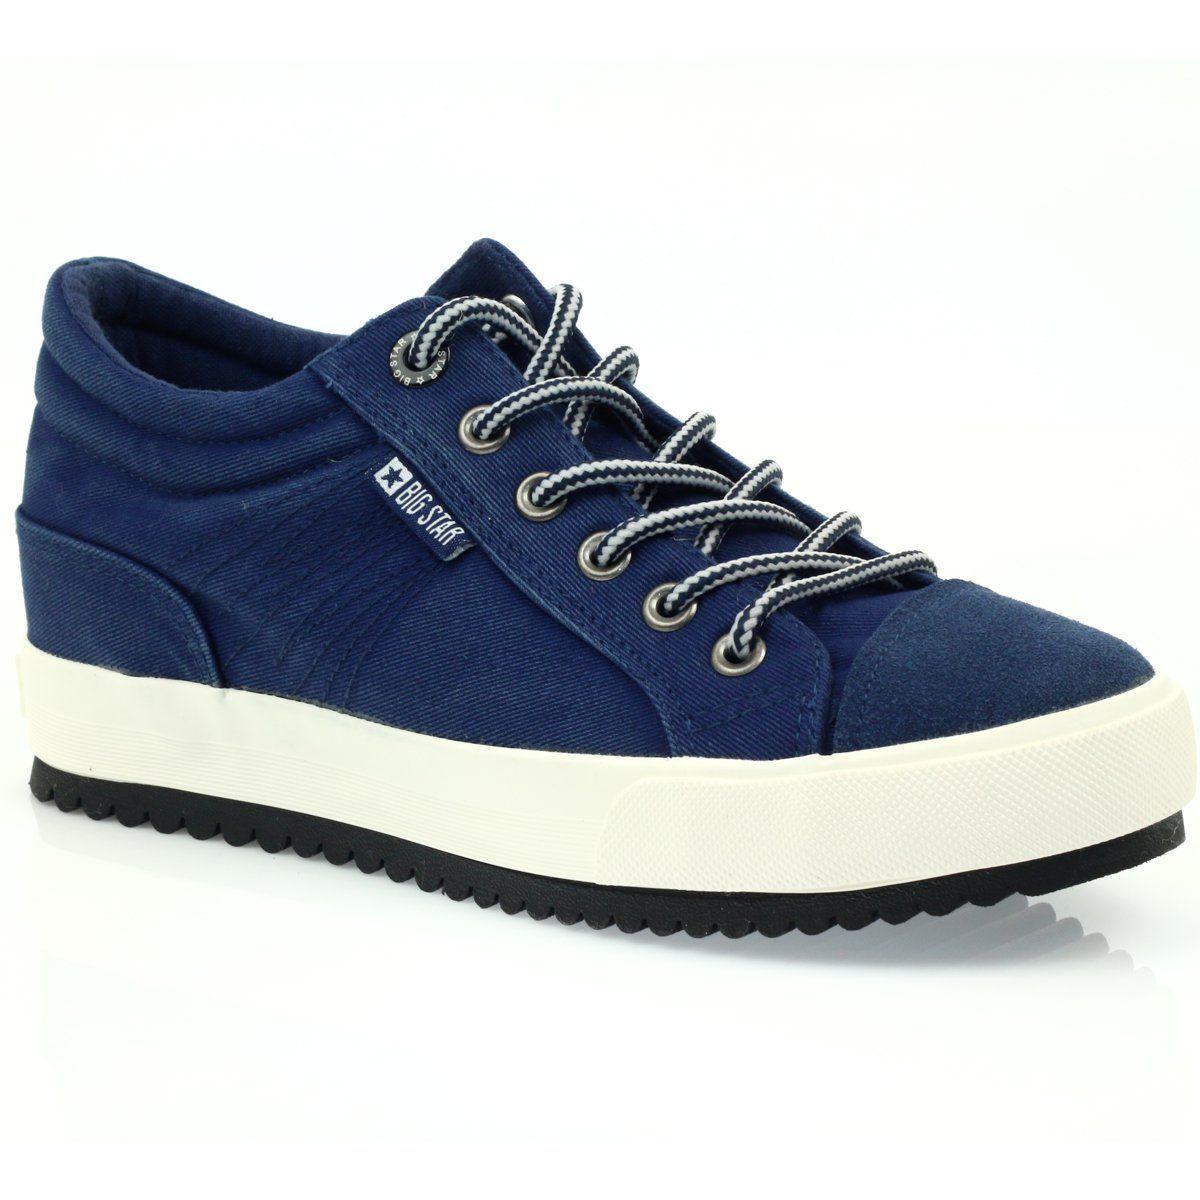 Trampki Na Koturnie Big Star 274502 Granatowe Star Sneakers Star Shoes Elegant Shoes